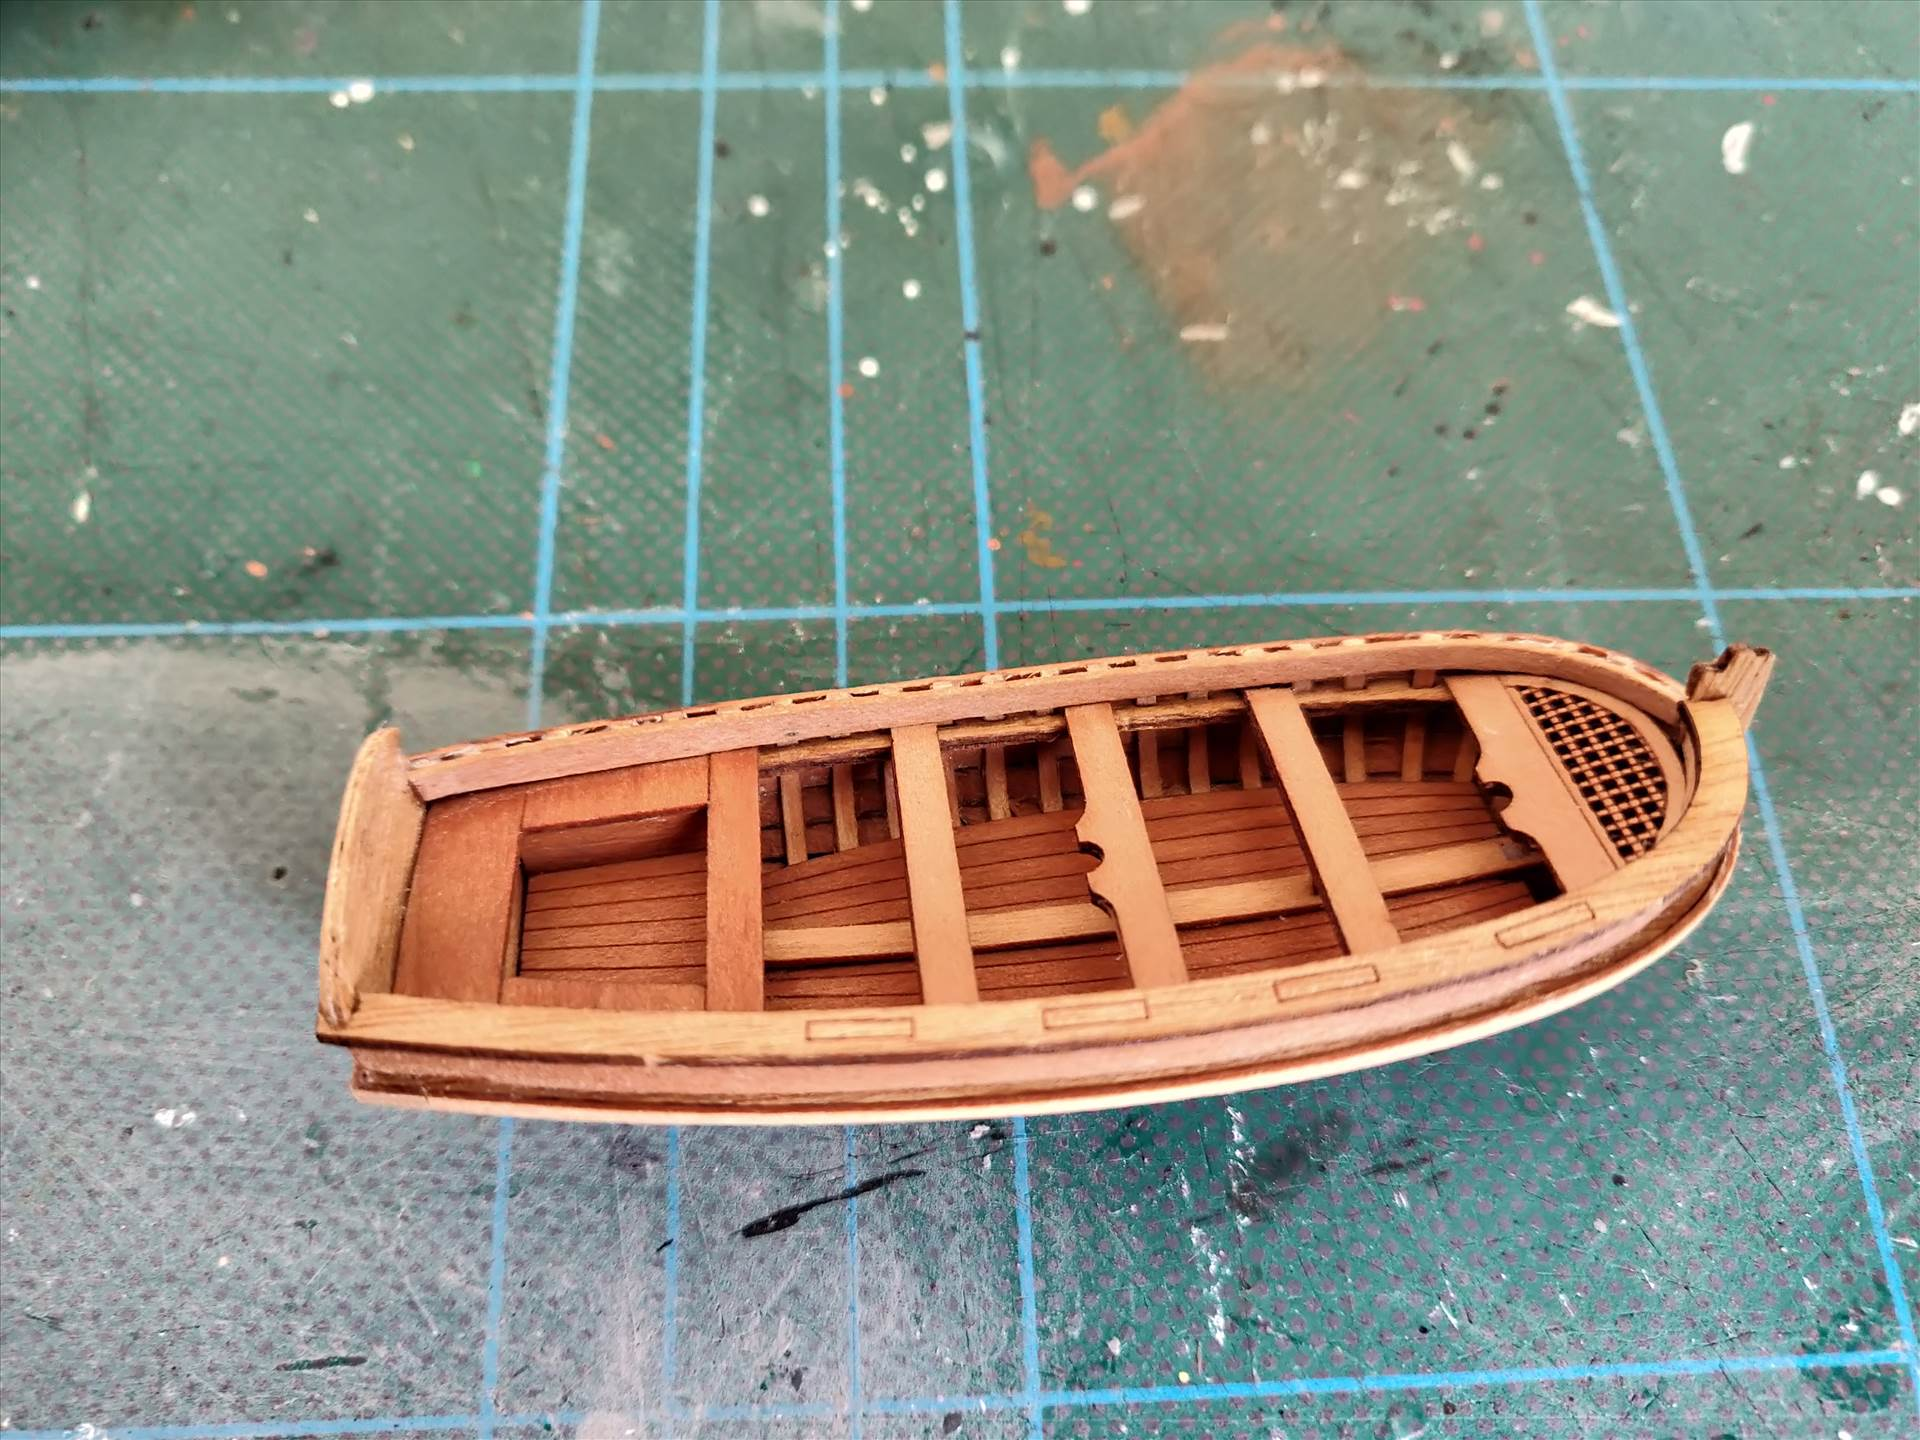 LifeboatG10.jpg  by Aginvicta